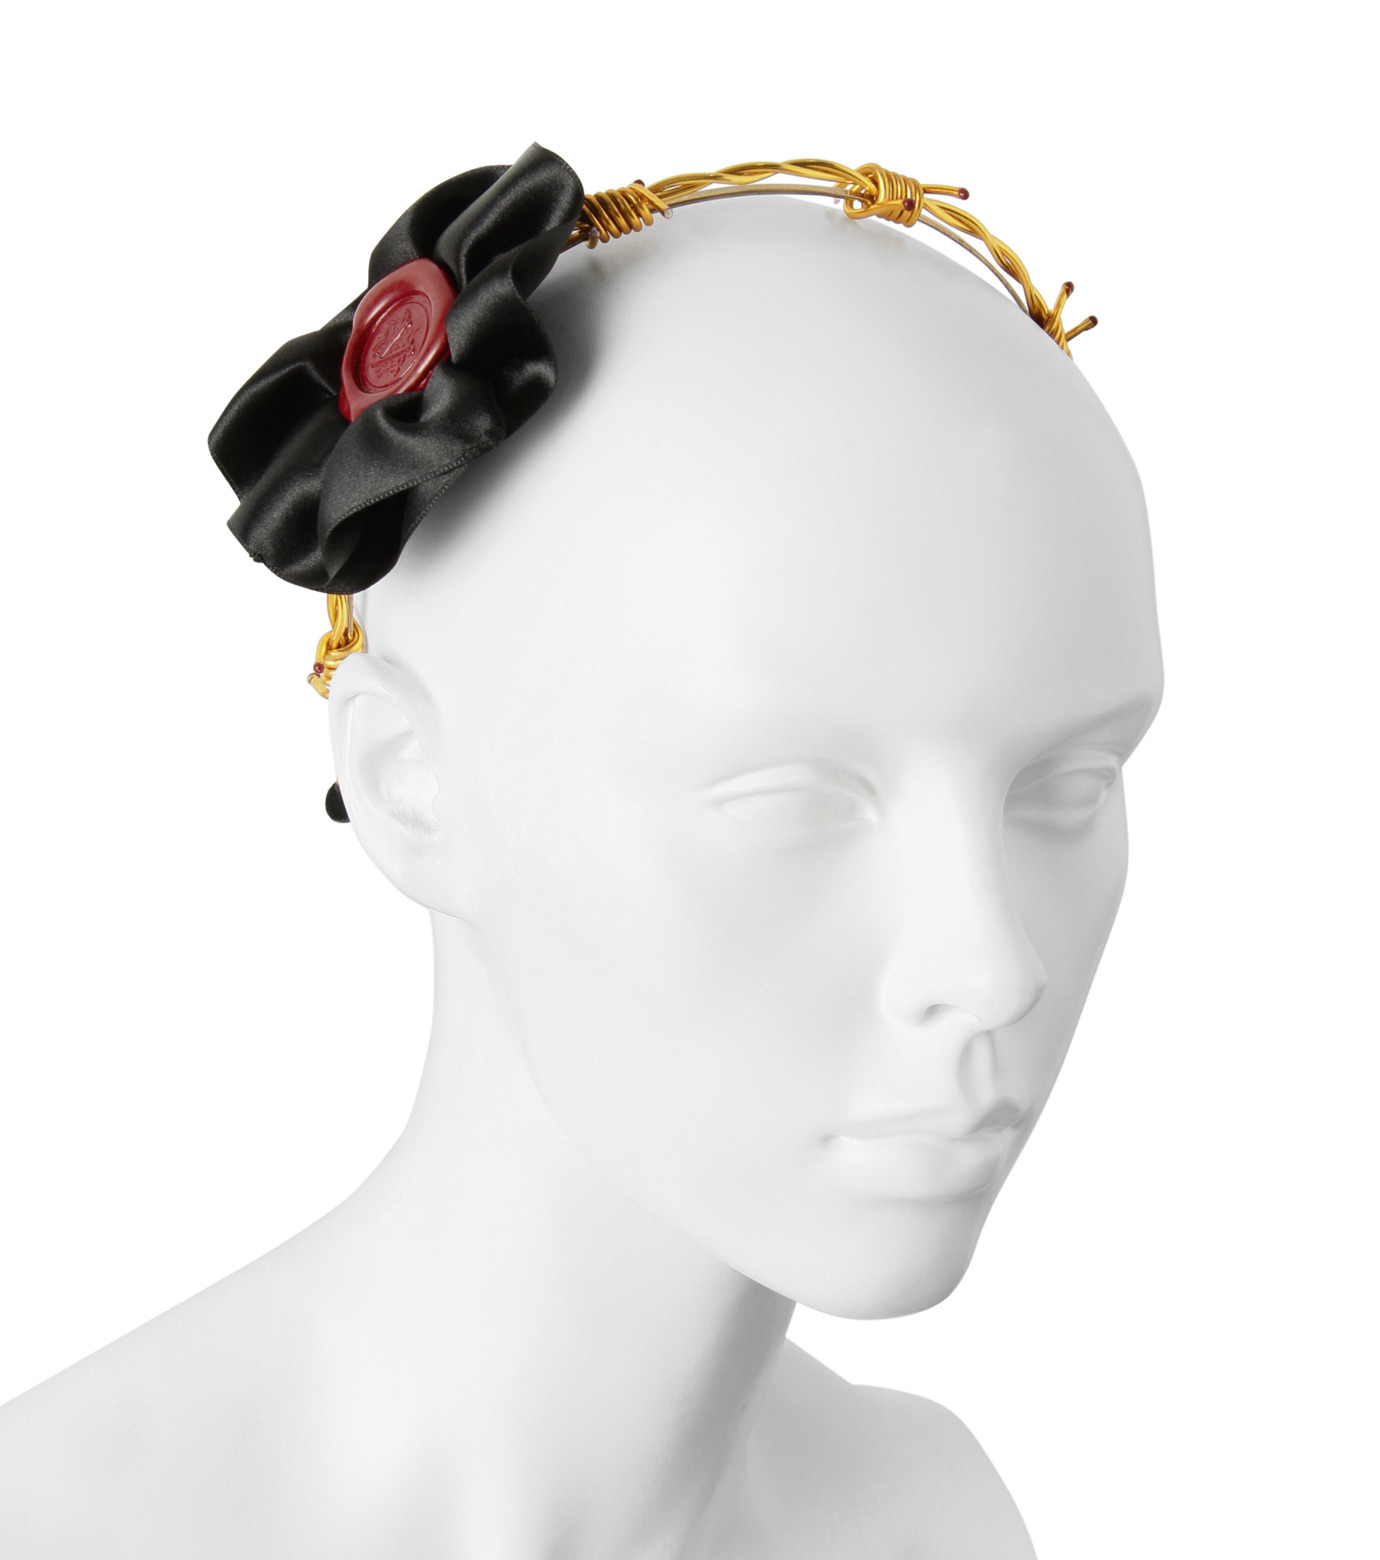 Victoria Grant(ヴィクトリア グラント)のBand of Thorns Headband-GOLD(アクセサリー/accessory)-No20-2 拡大詳細画像3